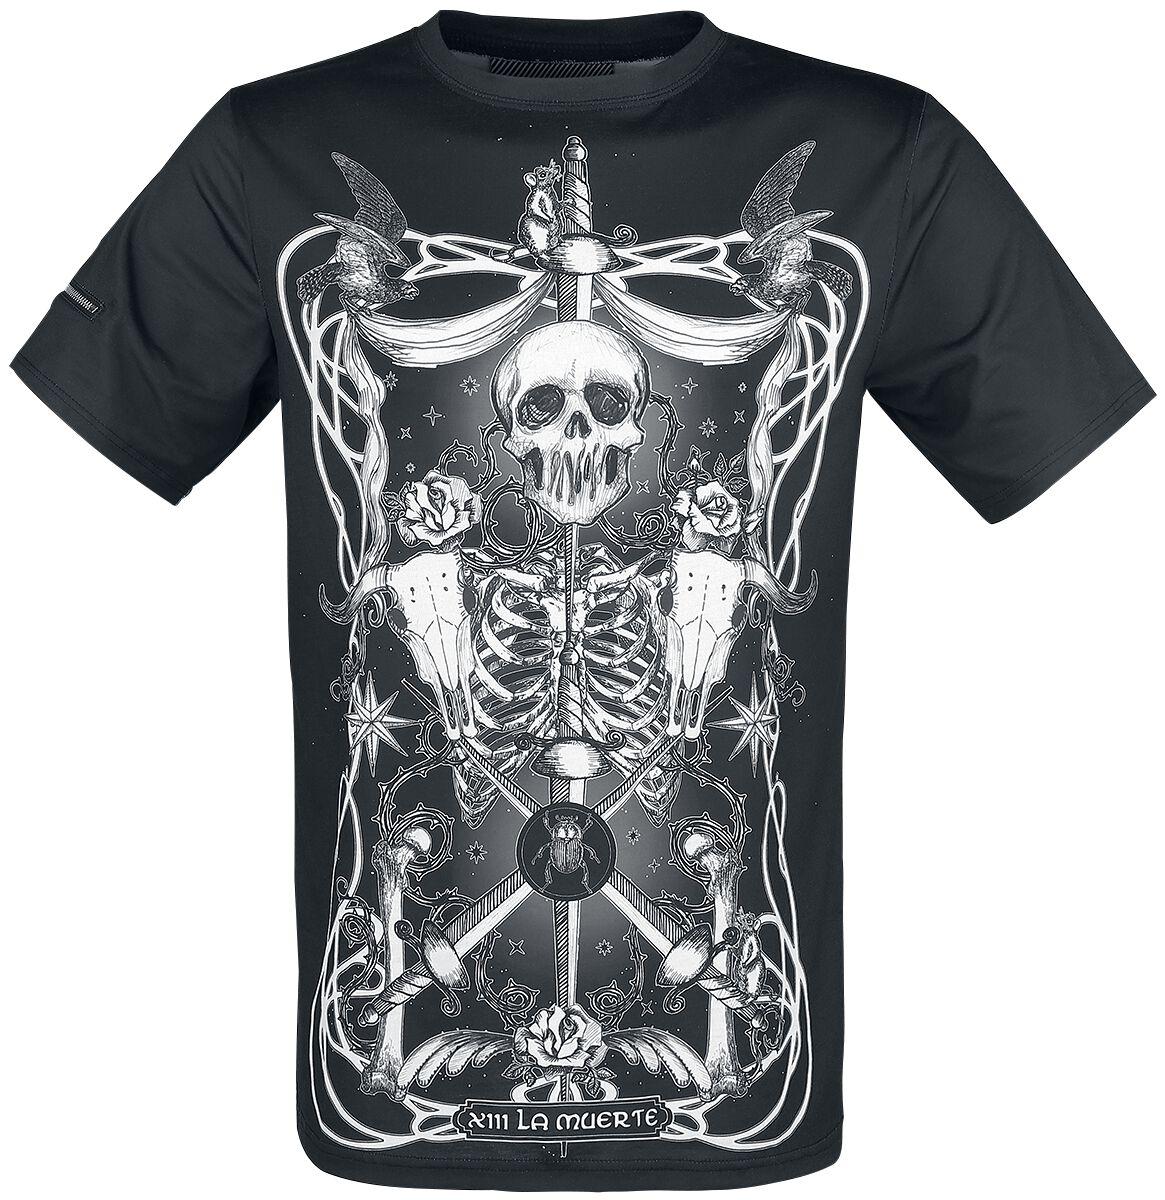 Marki - Koszulki - T-Shirt Jawbreaker Muerte Tarot T-Shirt czarny - 367919